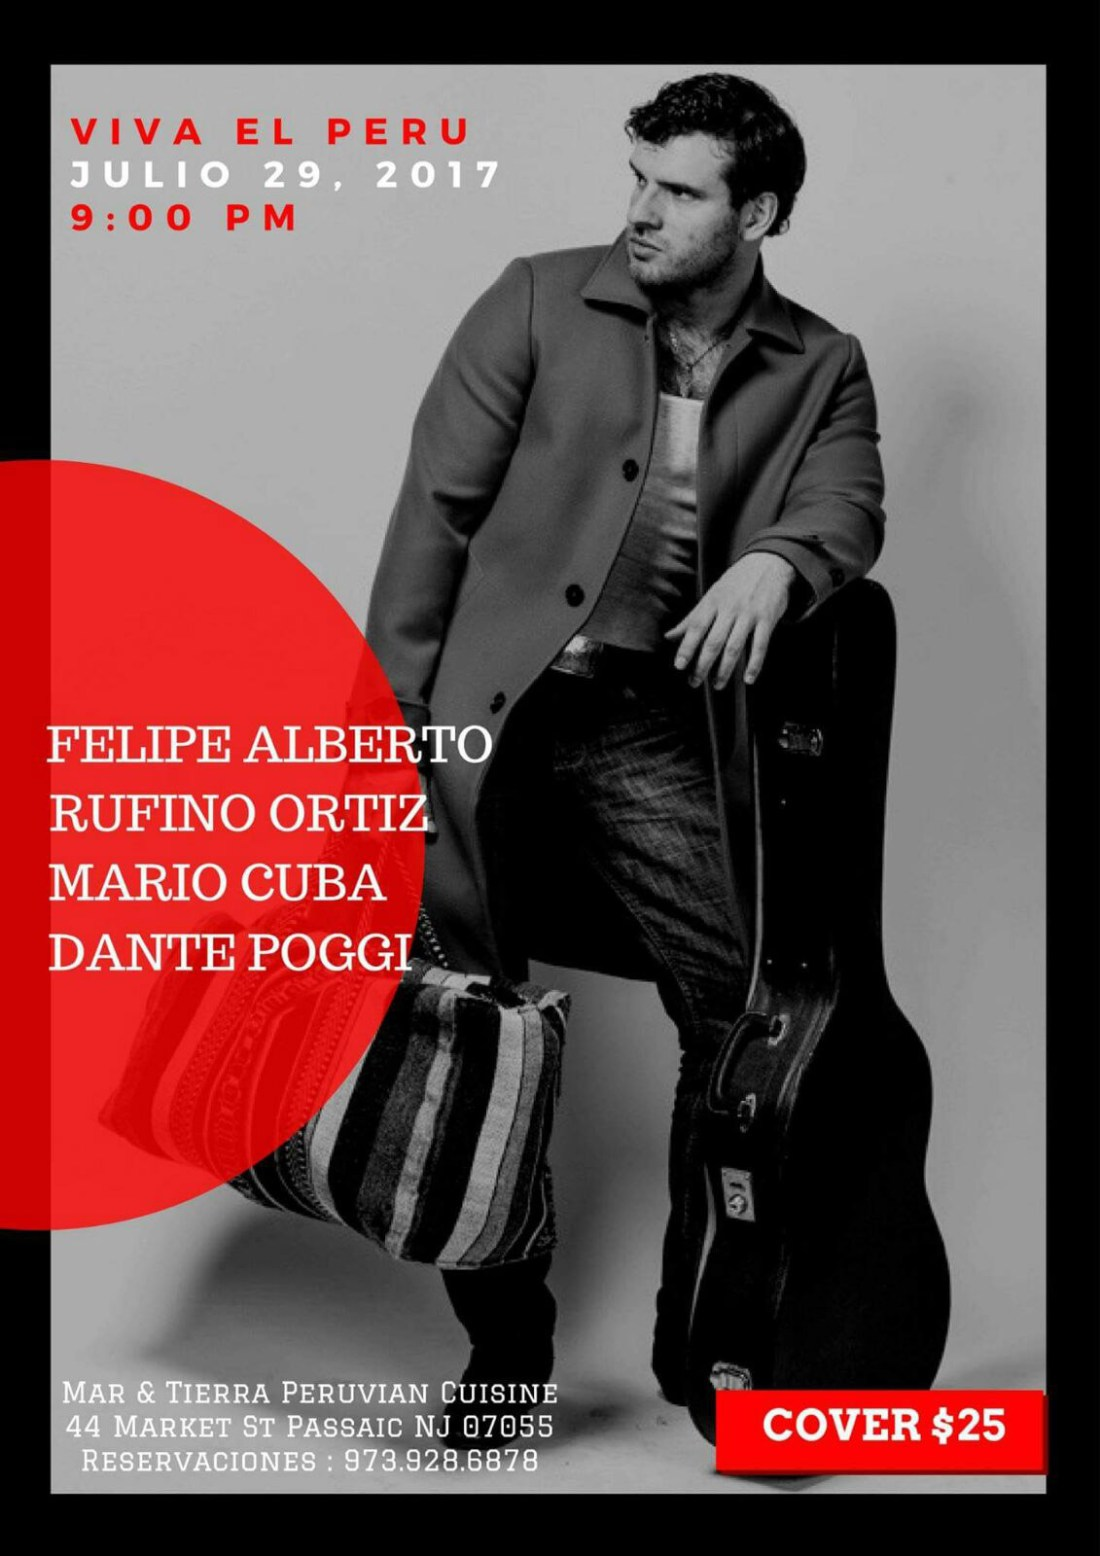 Felipe Alberto - Fiestas Patrias New Jersey